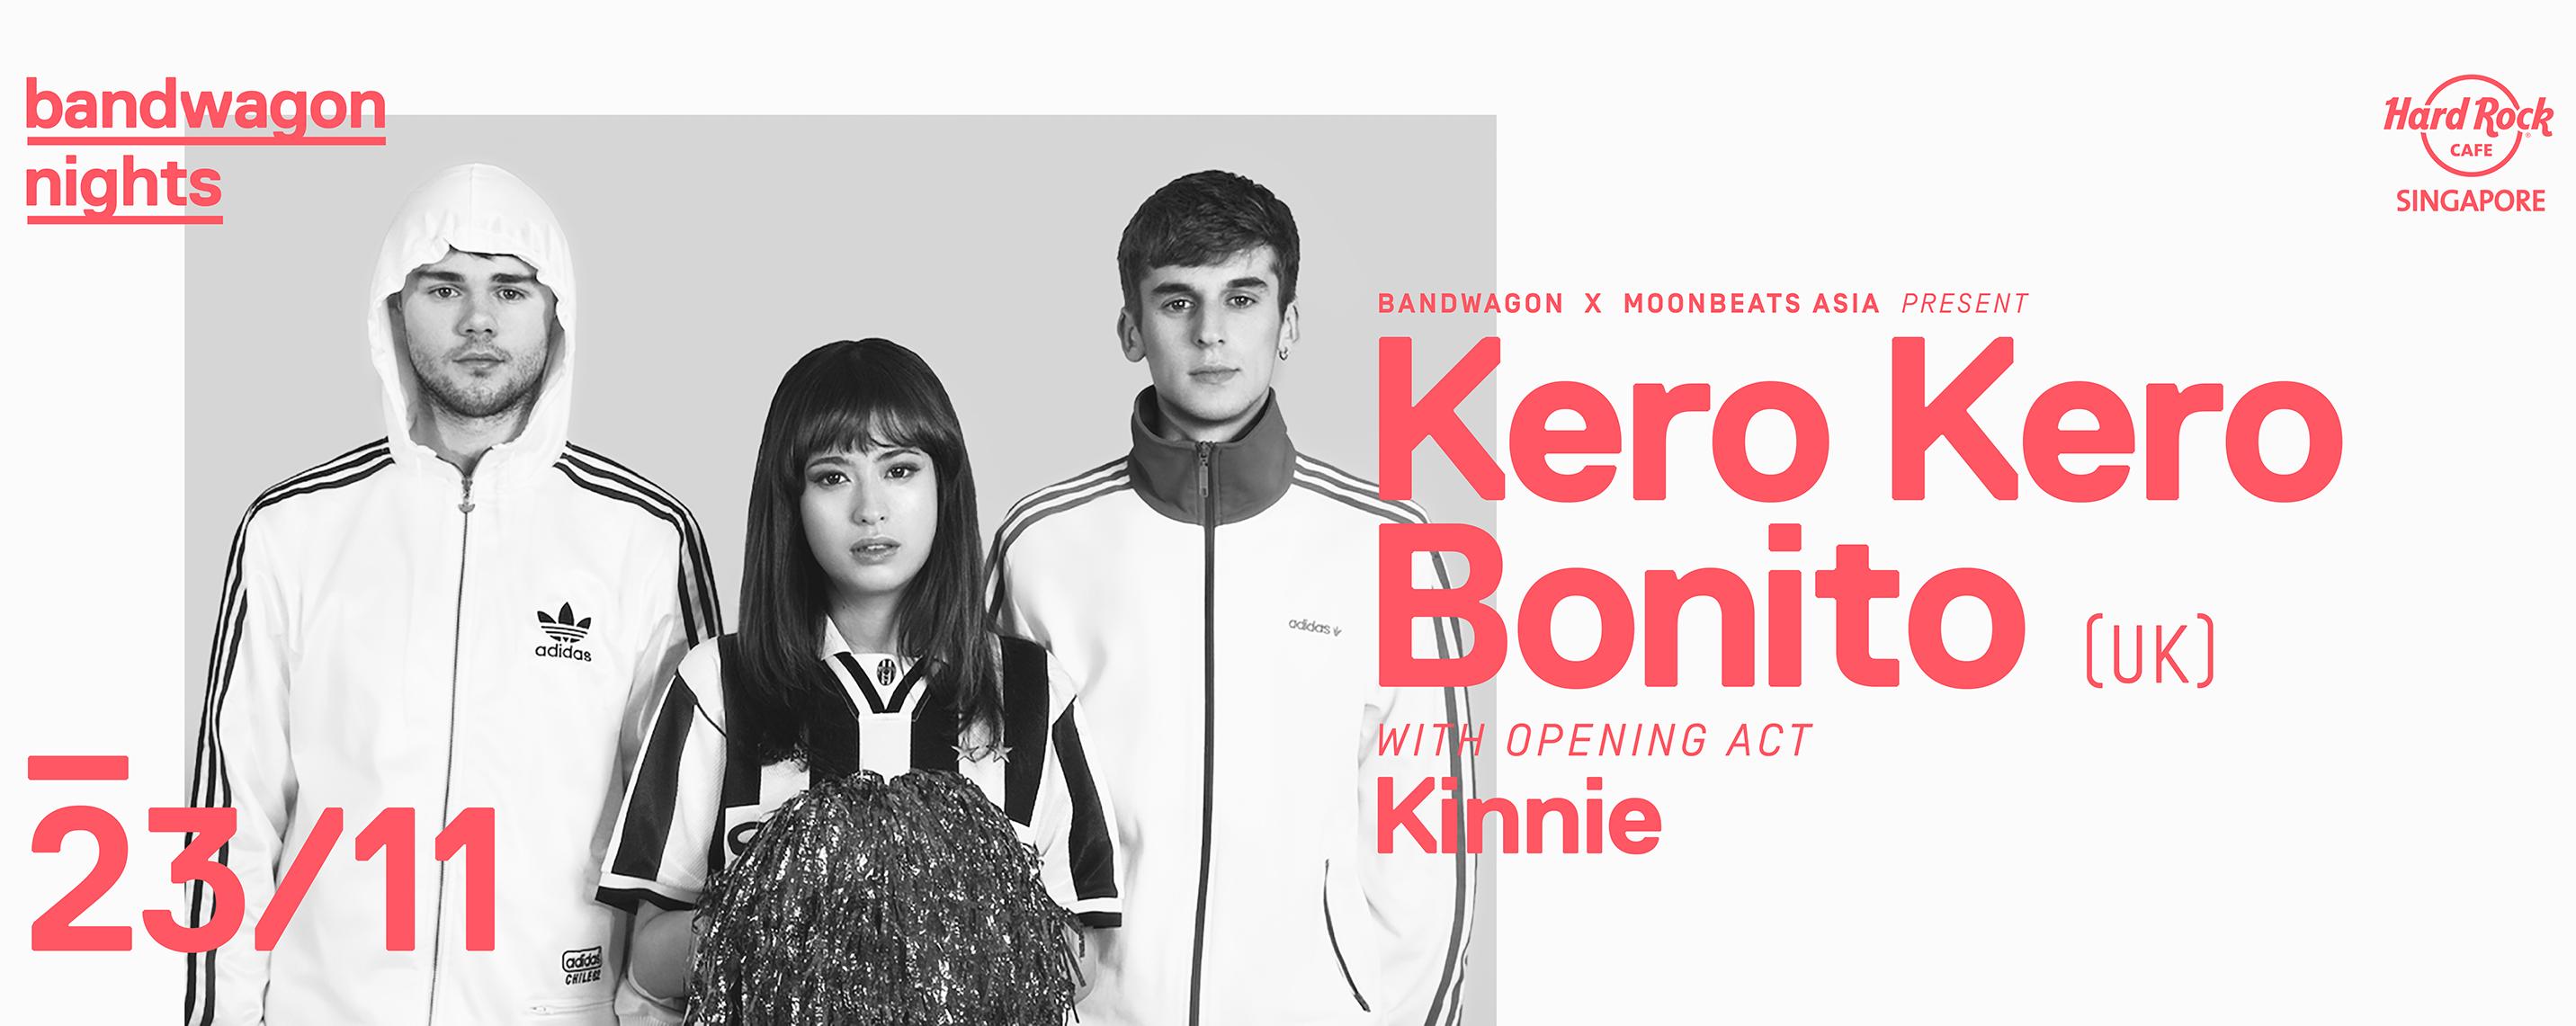 Bandwagon x Moonbeats Asia Present: Kero Kero Bonito w/ Kinnie